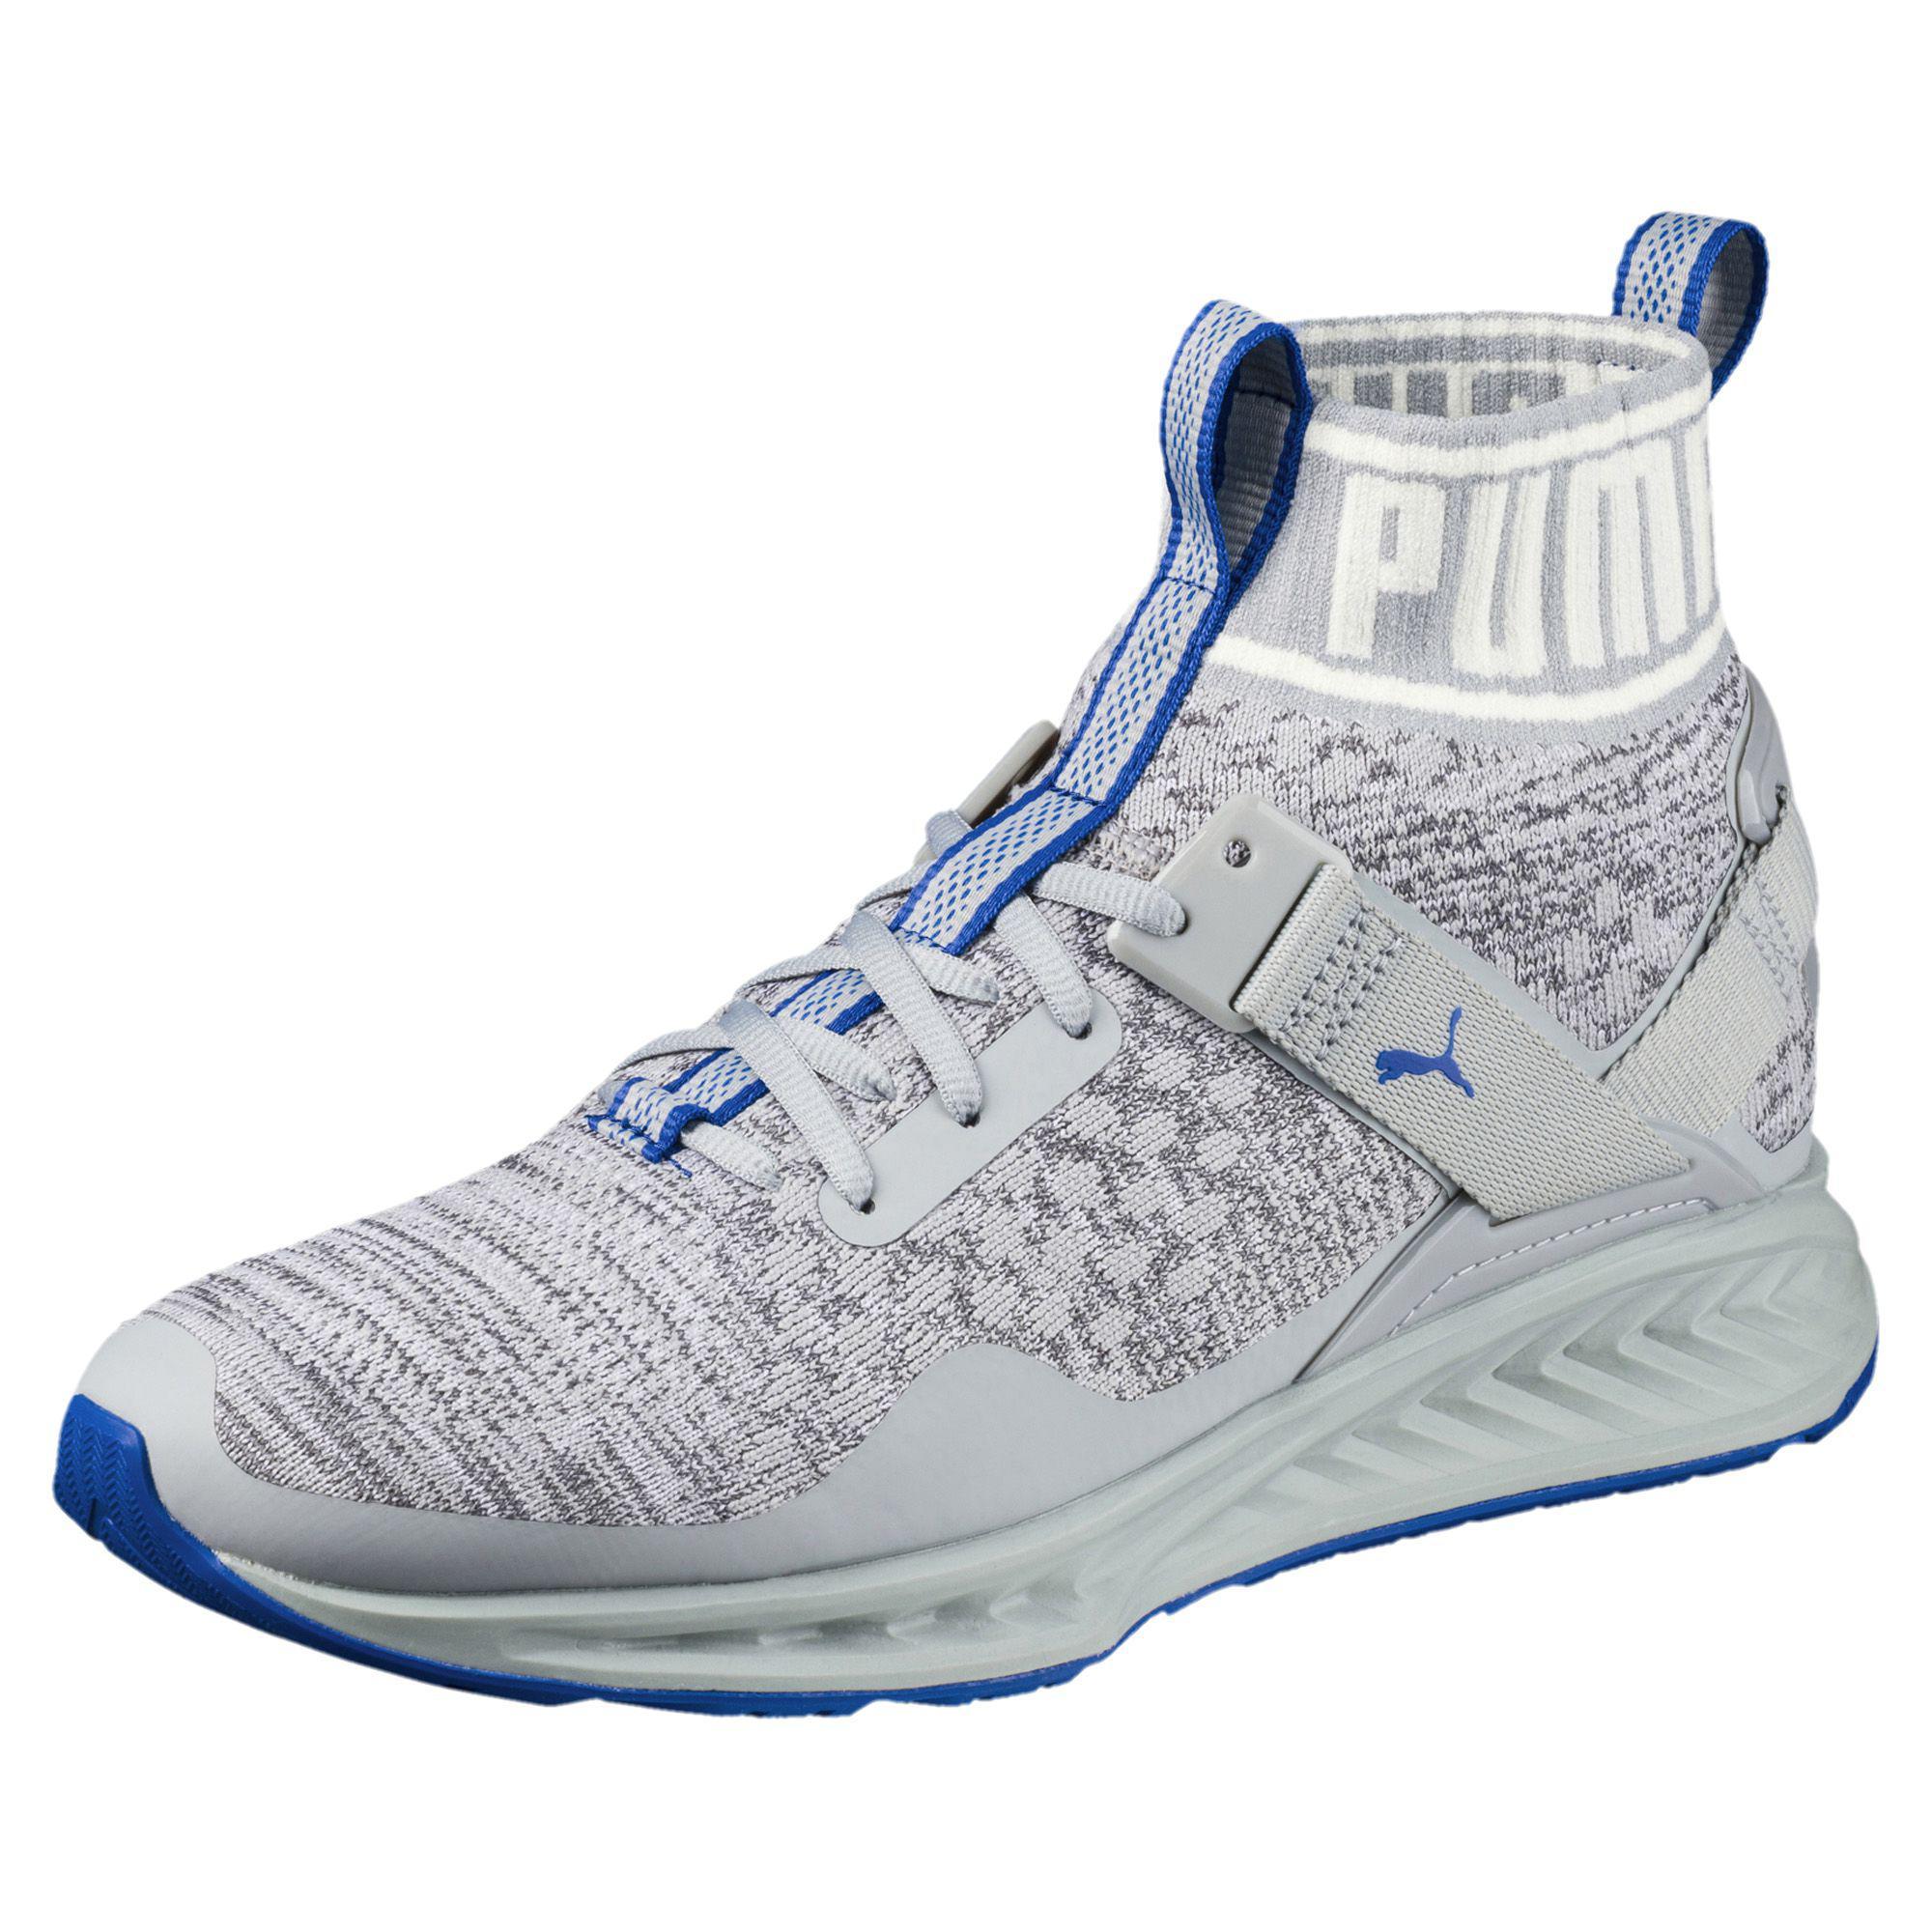 ba532e8c026 Lyst - Puma Ignite Evoknit Men s Training Shoes in Blue for Men